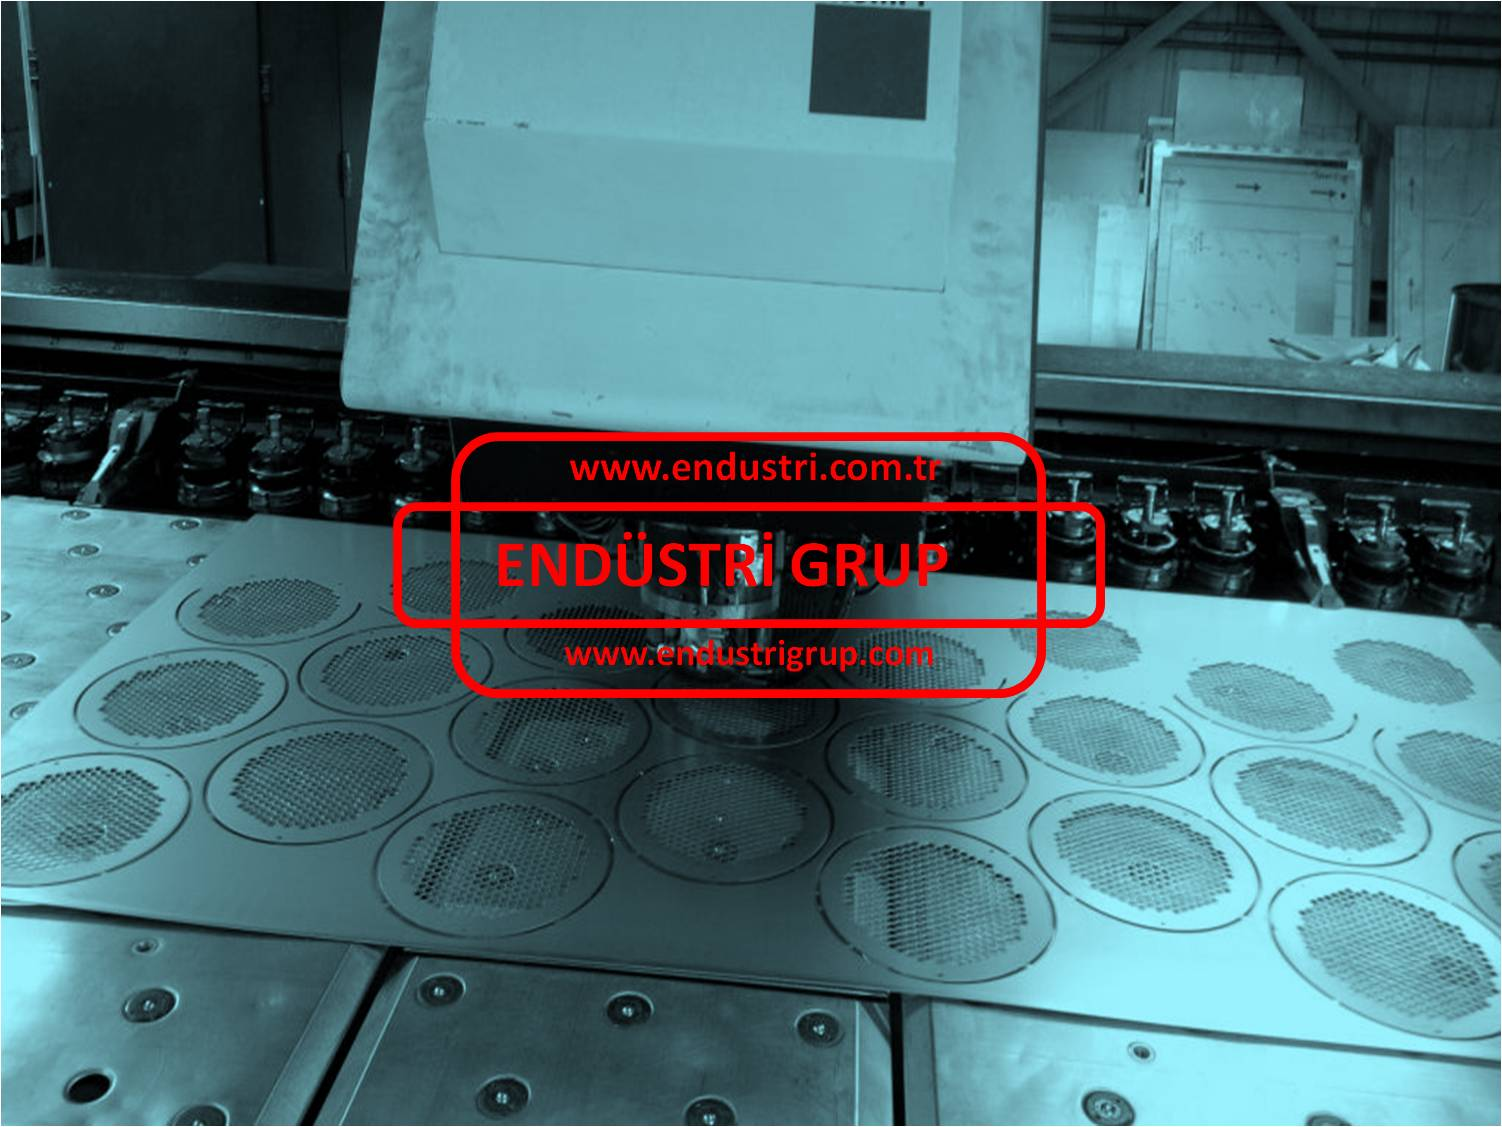 cnc-plazma-pres-punch-kesim-modelleri-5-1-300x225